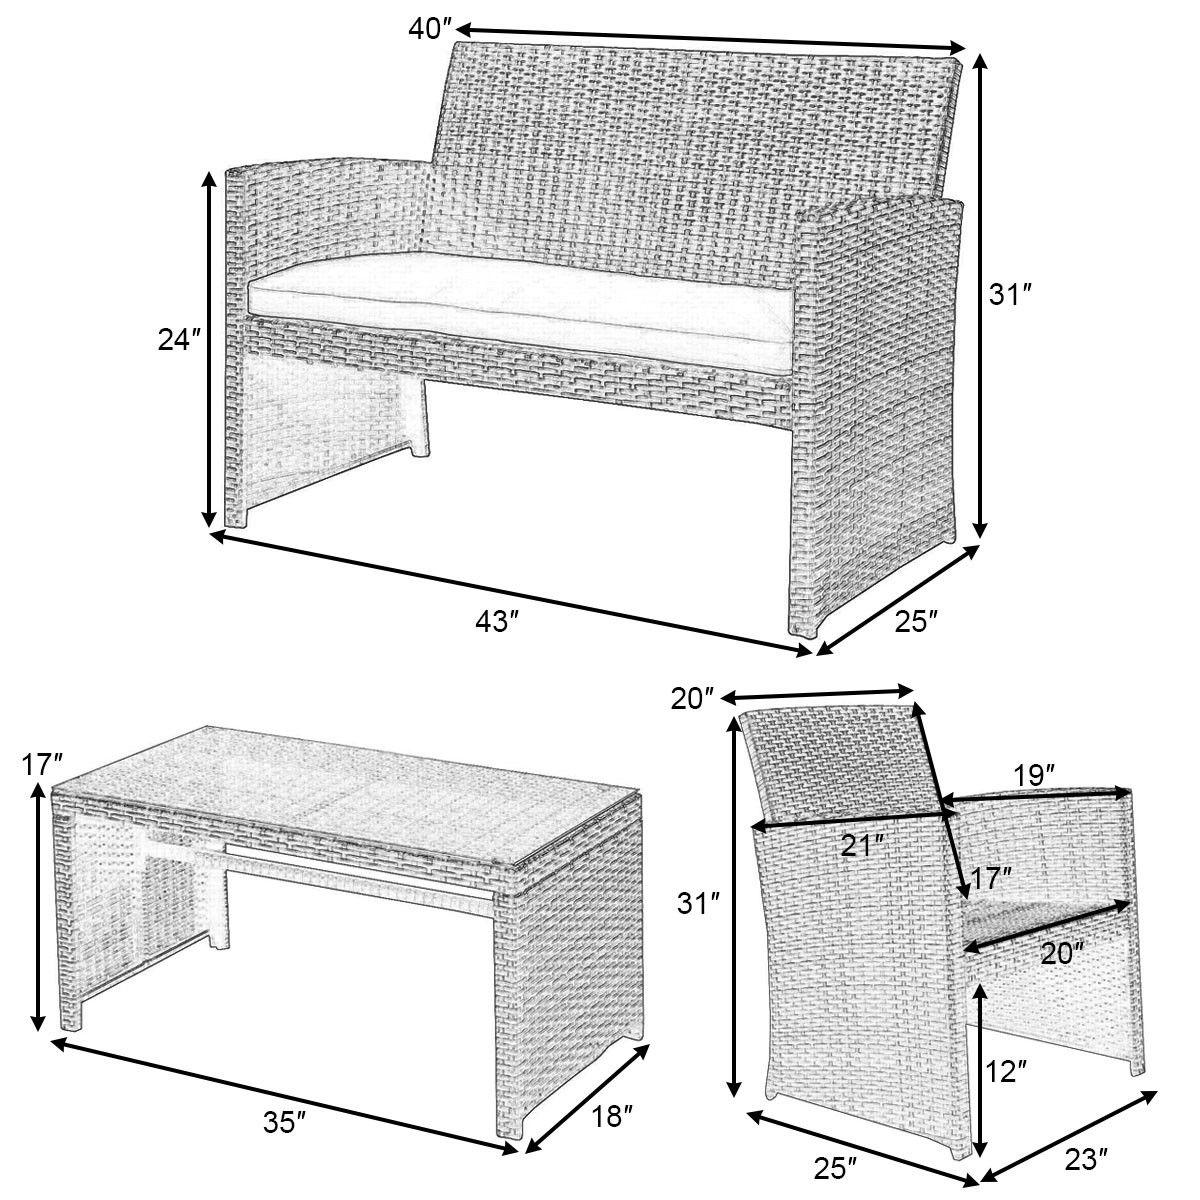 Costway 4 Pc Rattan Patio Furniture Set Garden Lawn Sofa Wicker Cushioned Seat Black 2